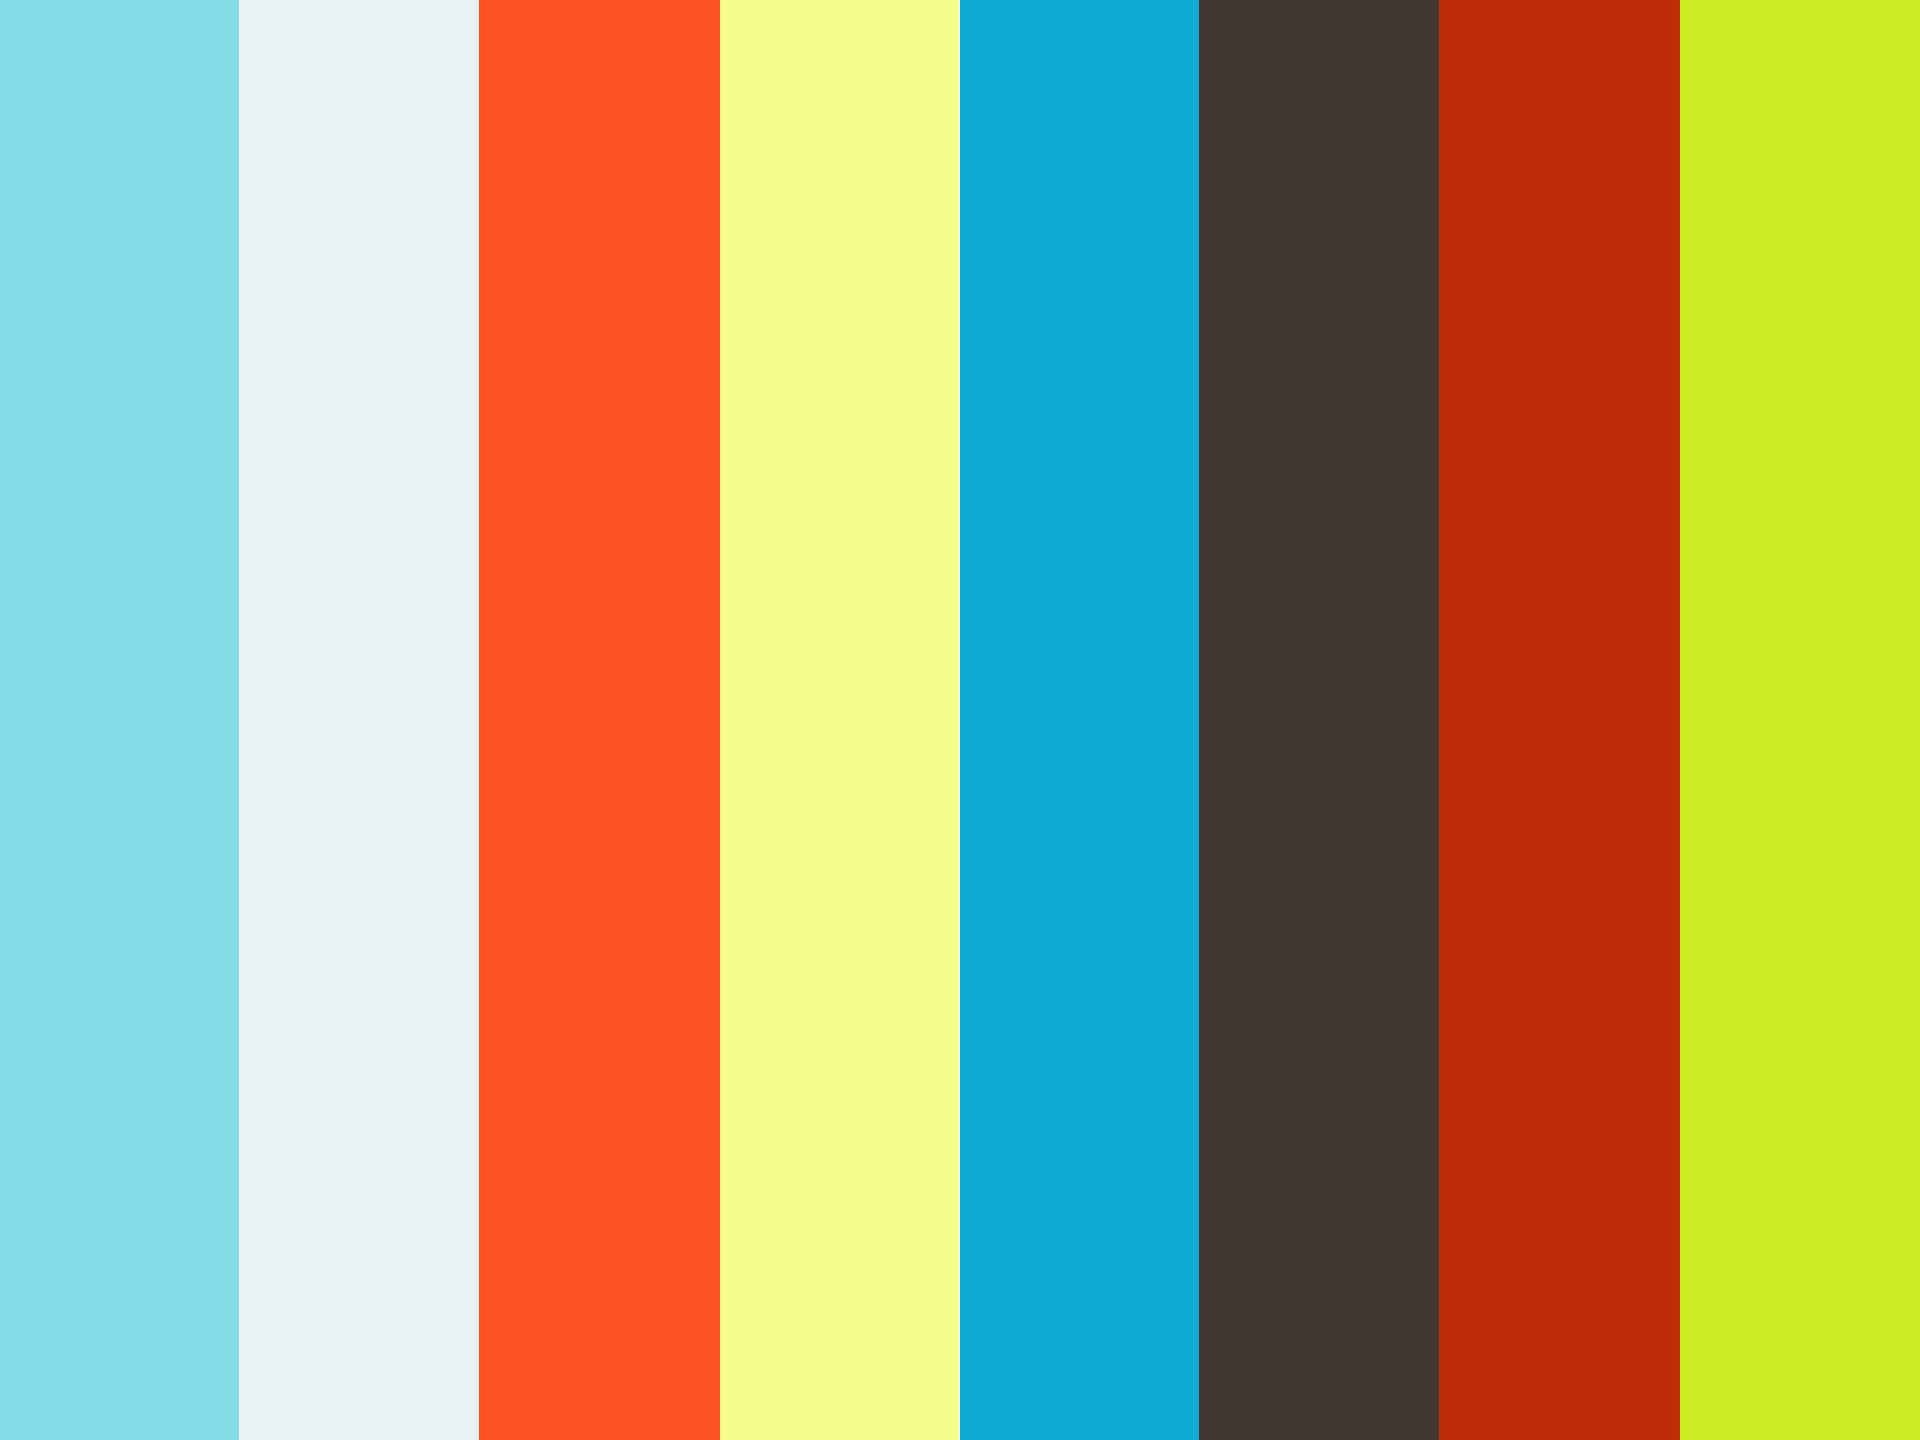 New! GMC Siera 2020 Black for sale